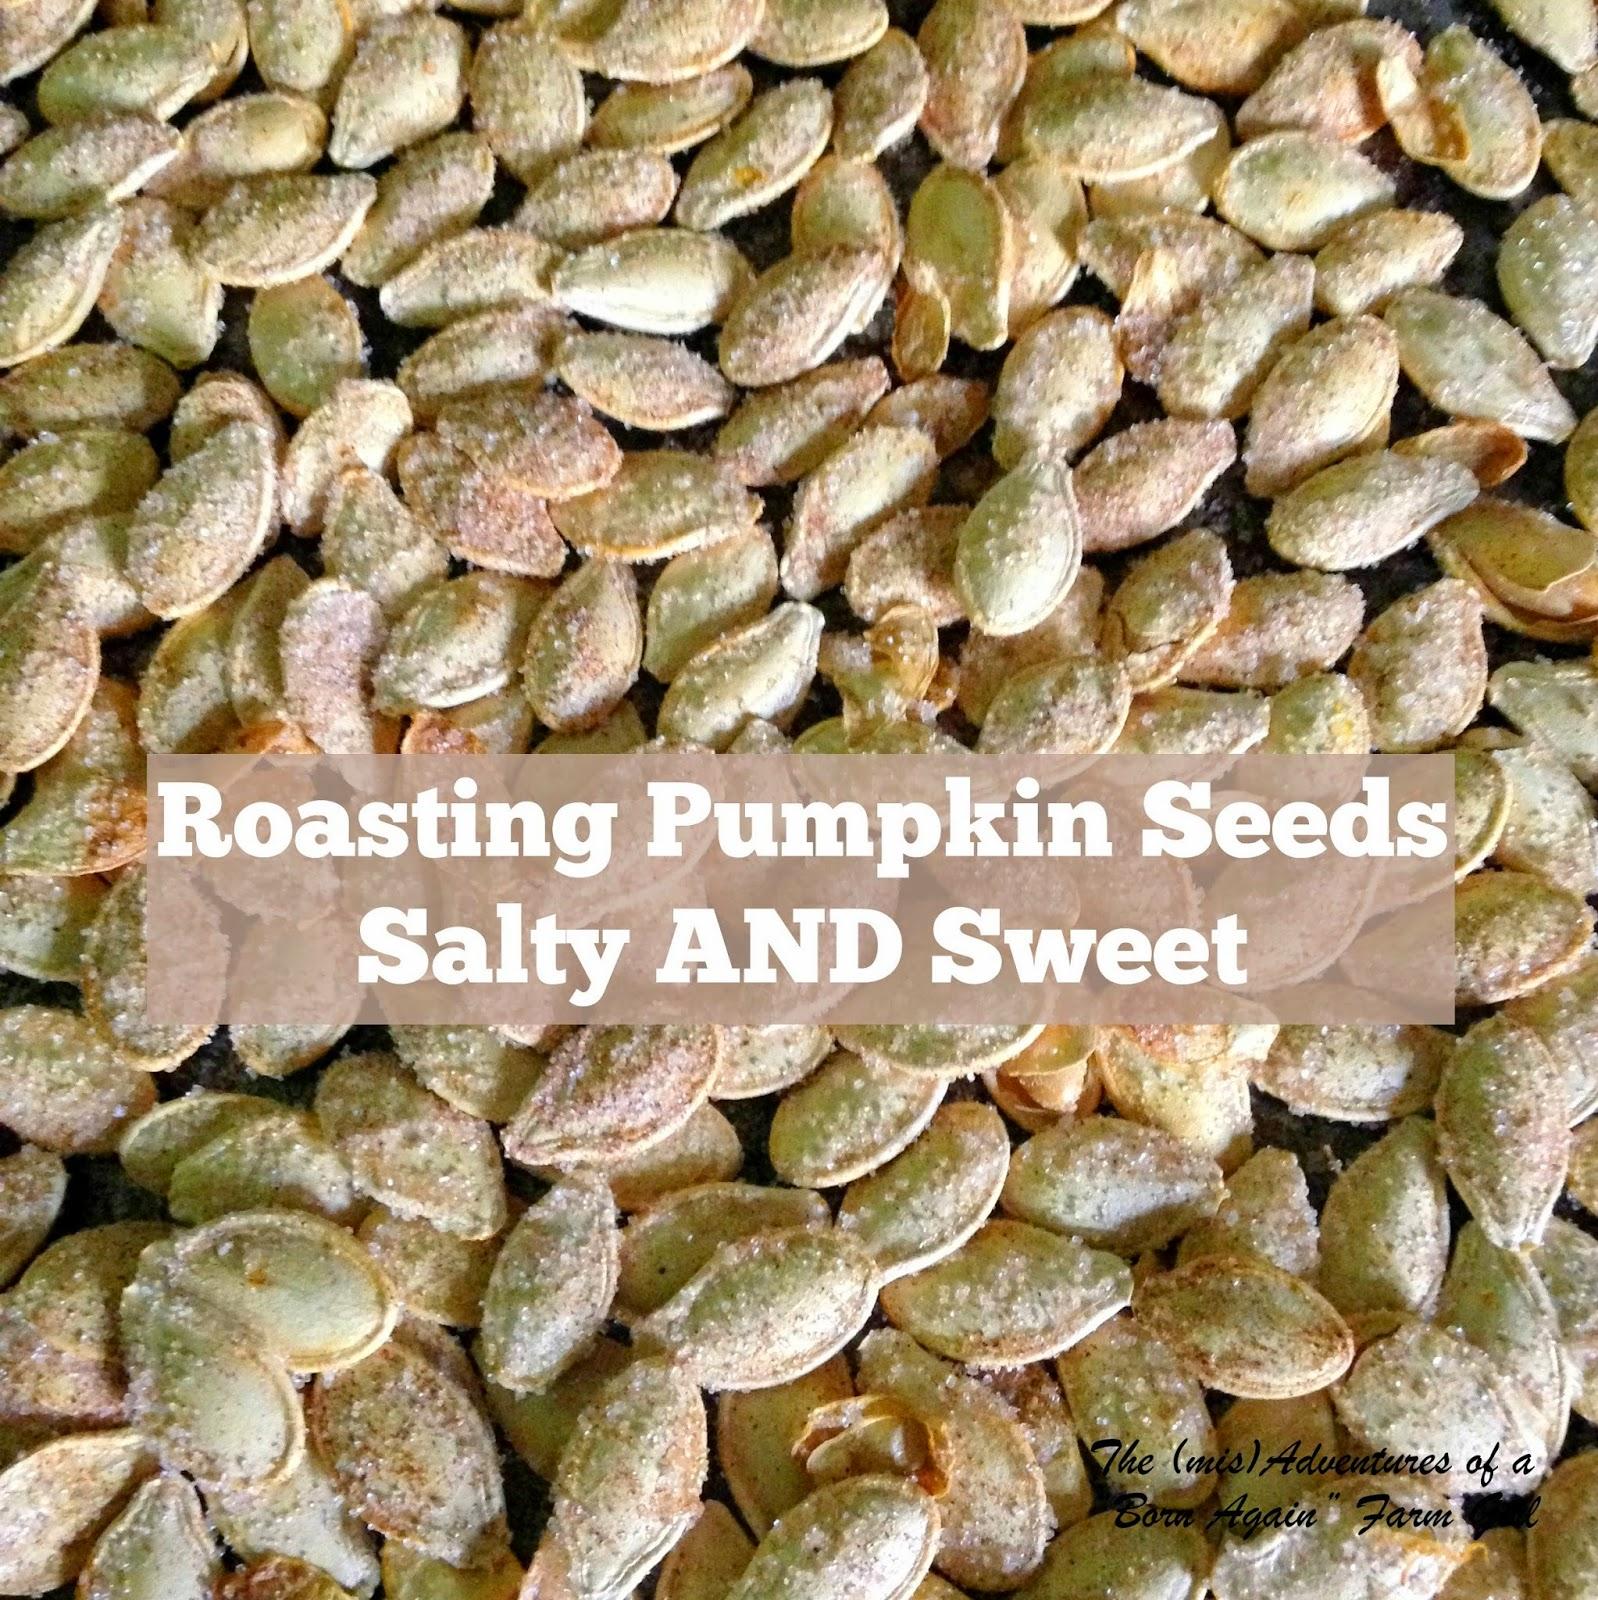 Roasting Pumpkin Seed, Salty AND Sweet